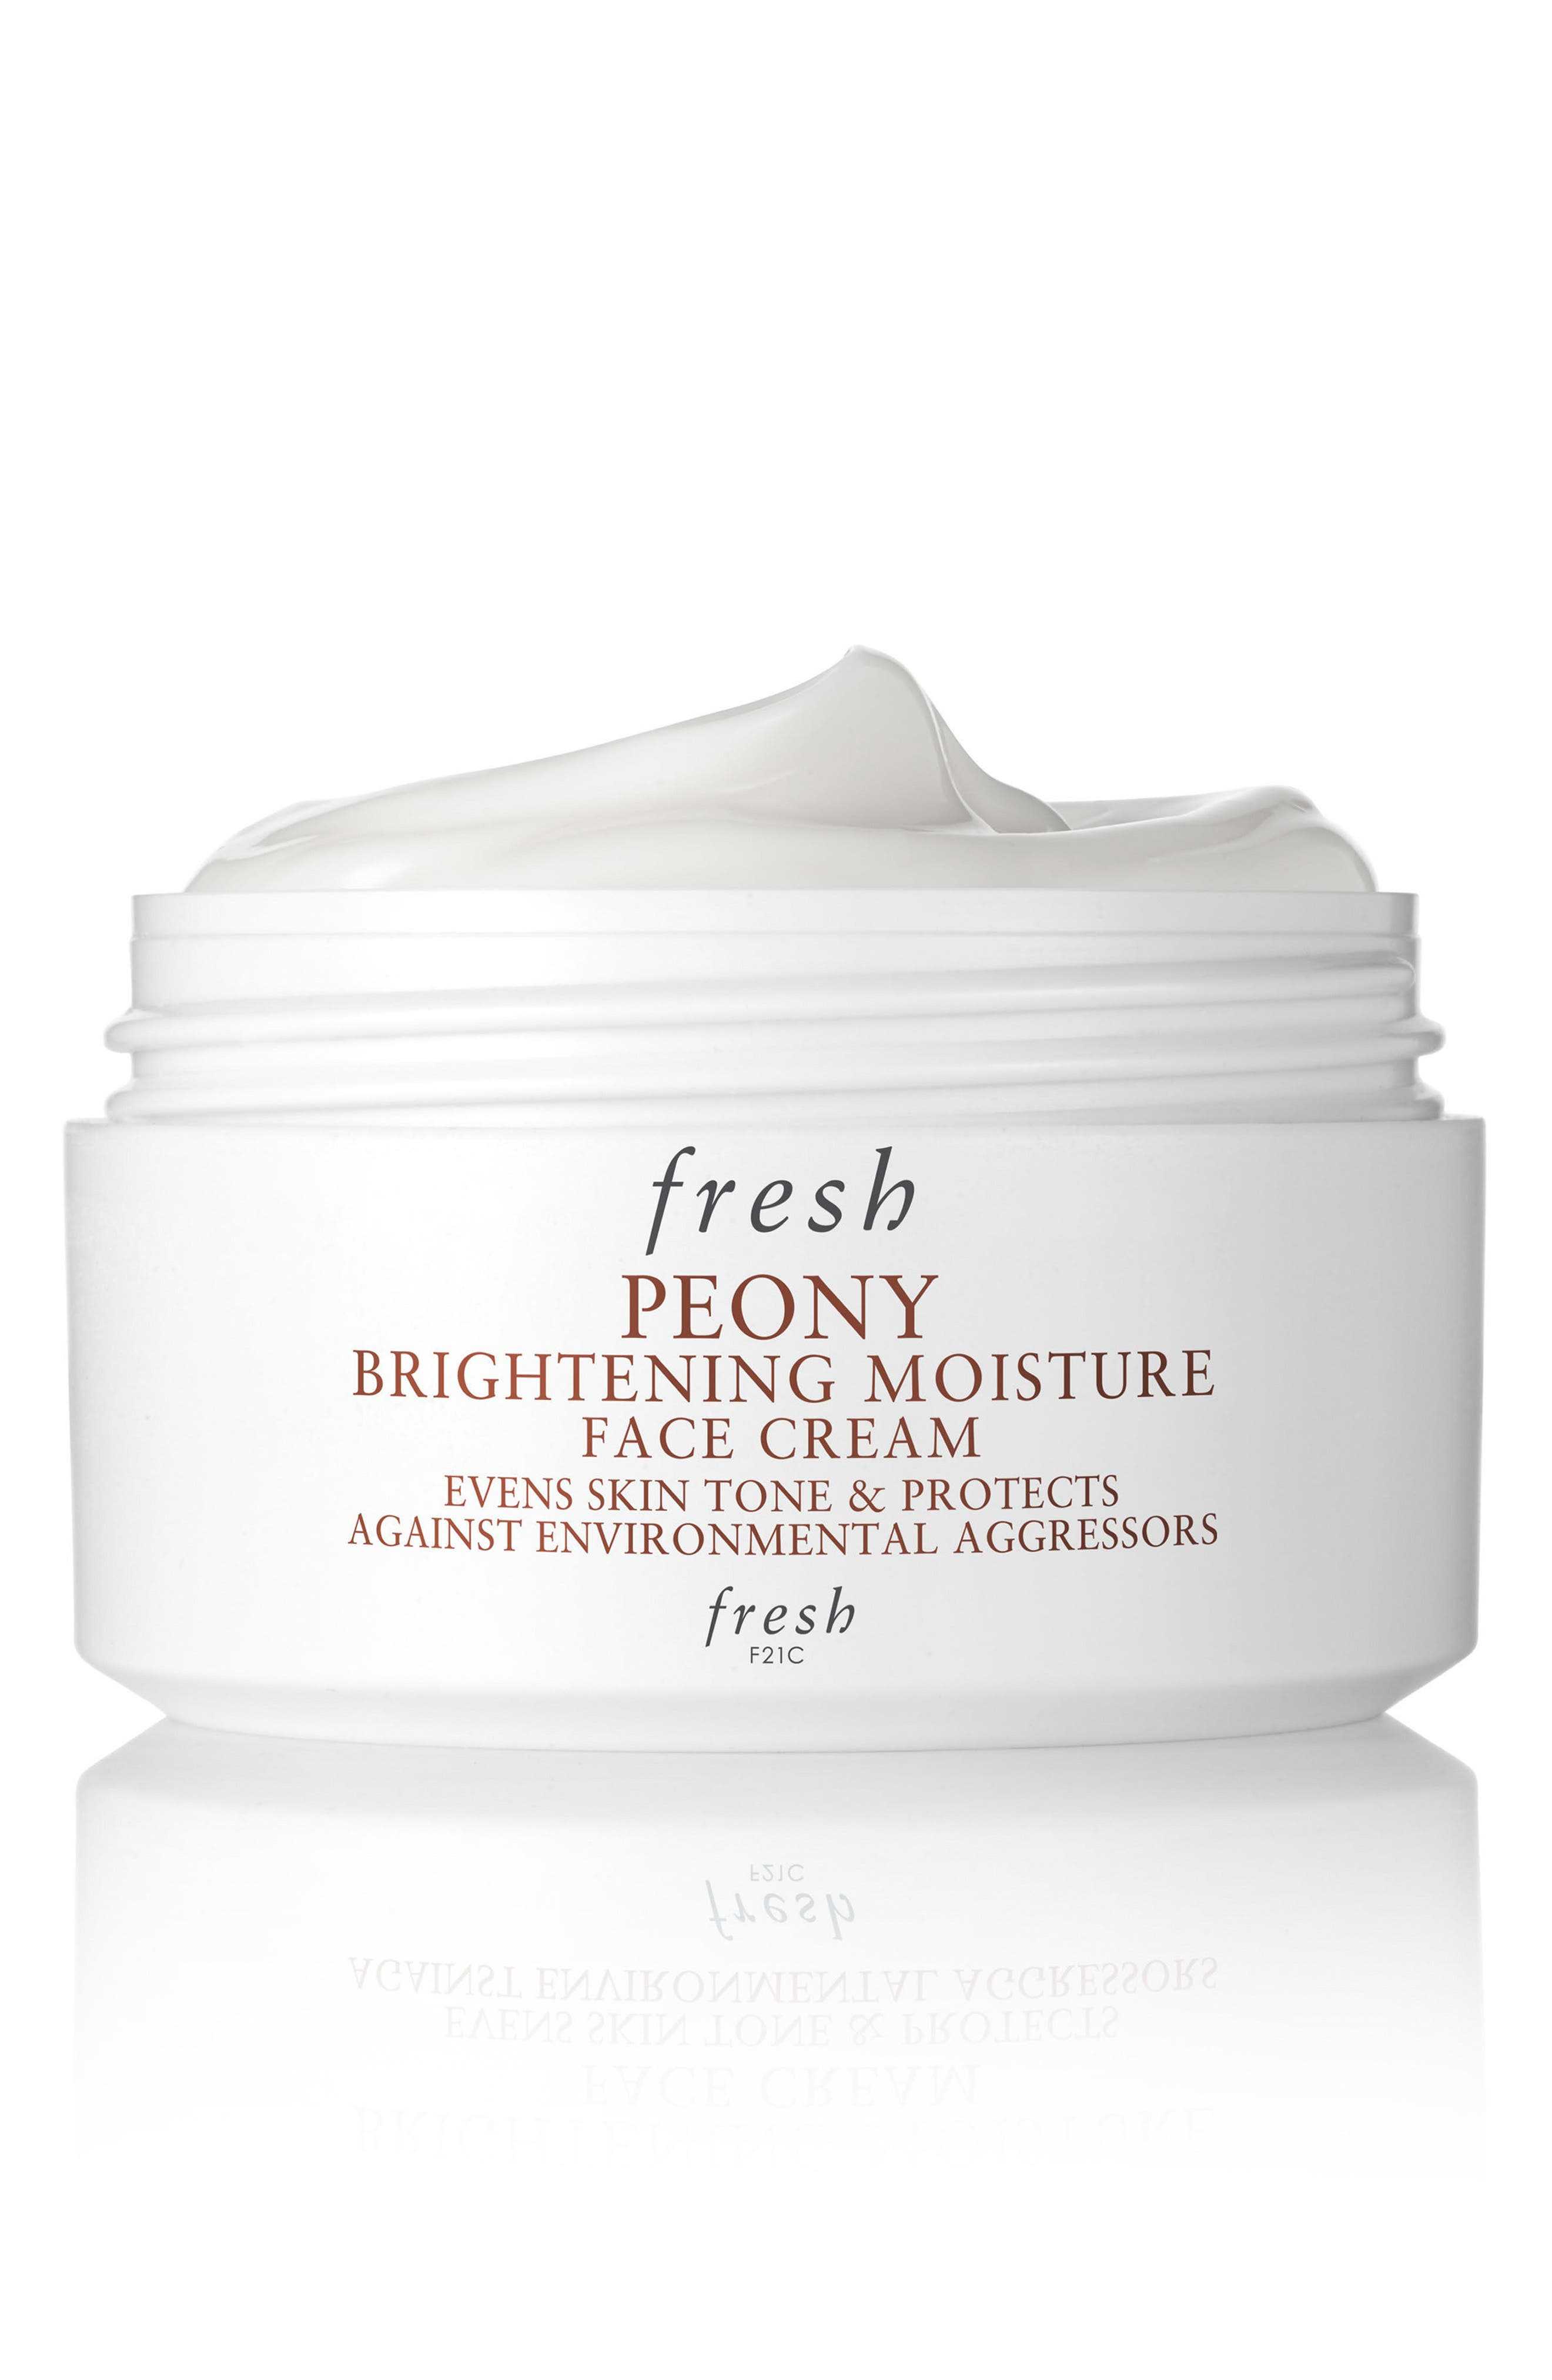 Peony Brightening Moisture Face Cream,                         Main,                         color, NO COLOR